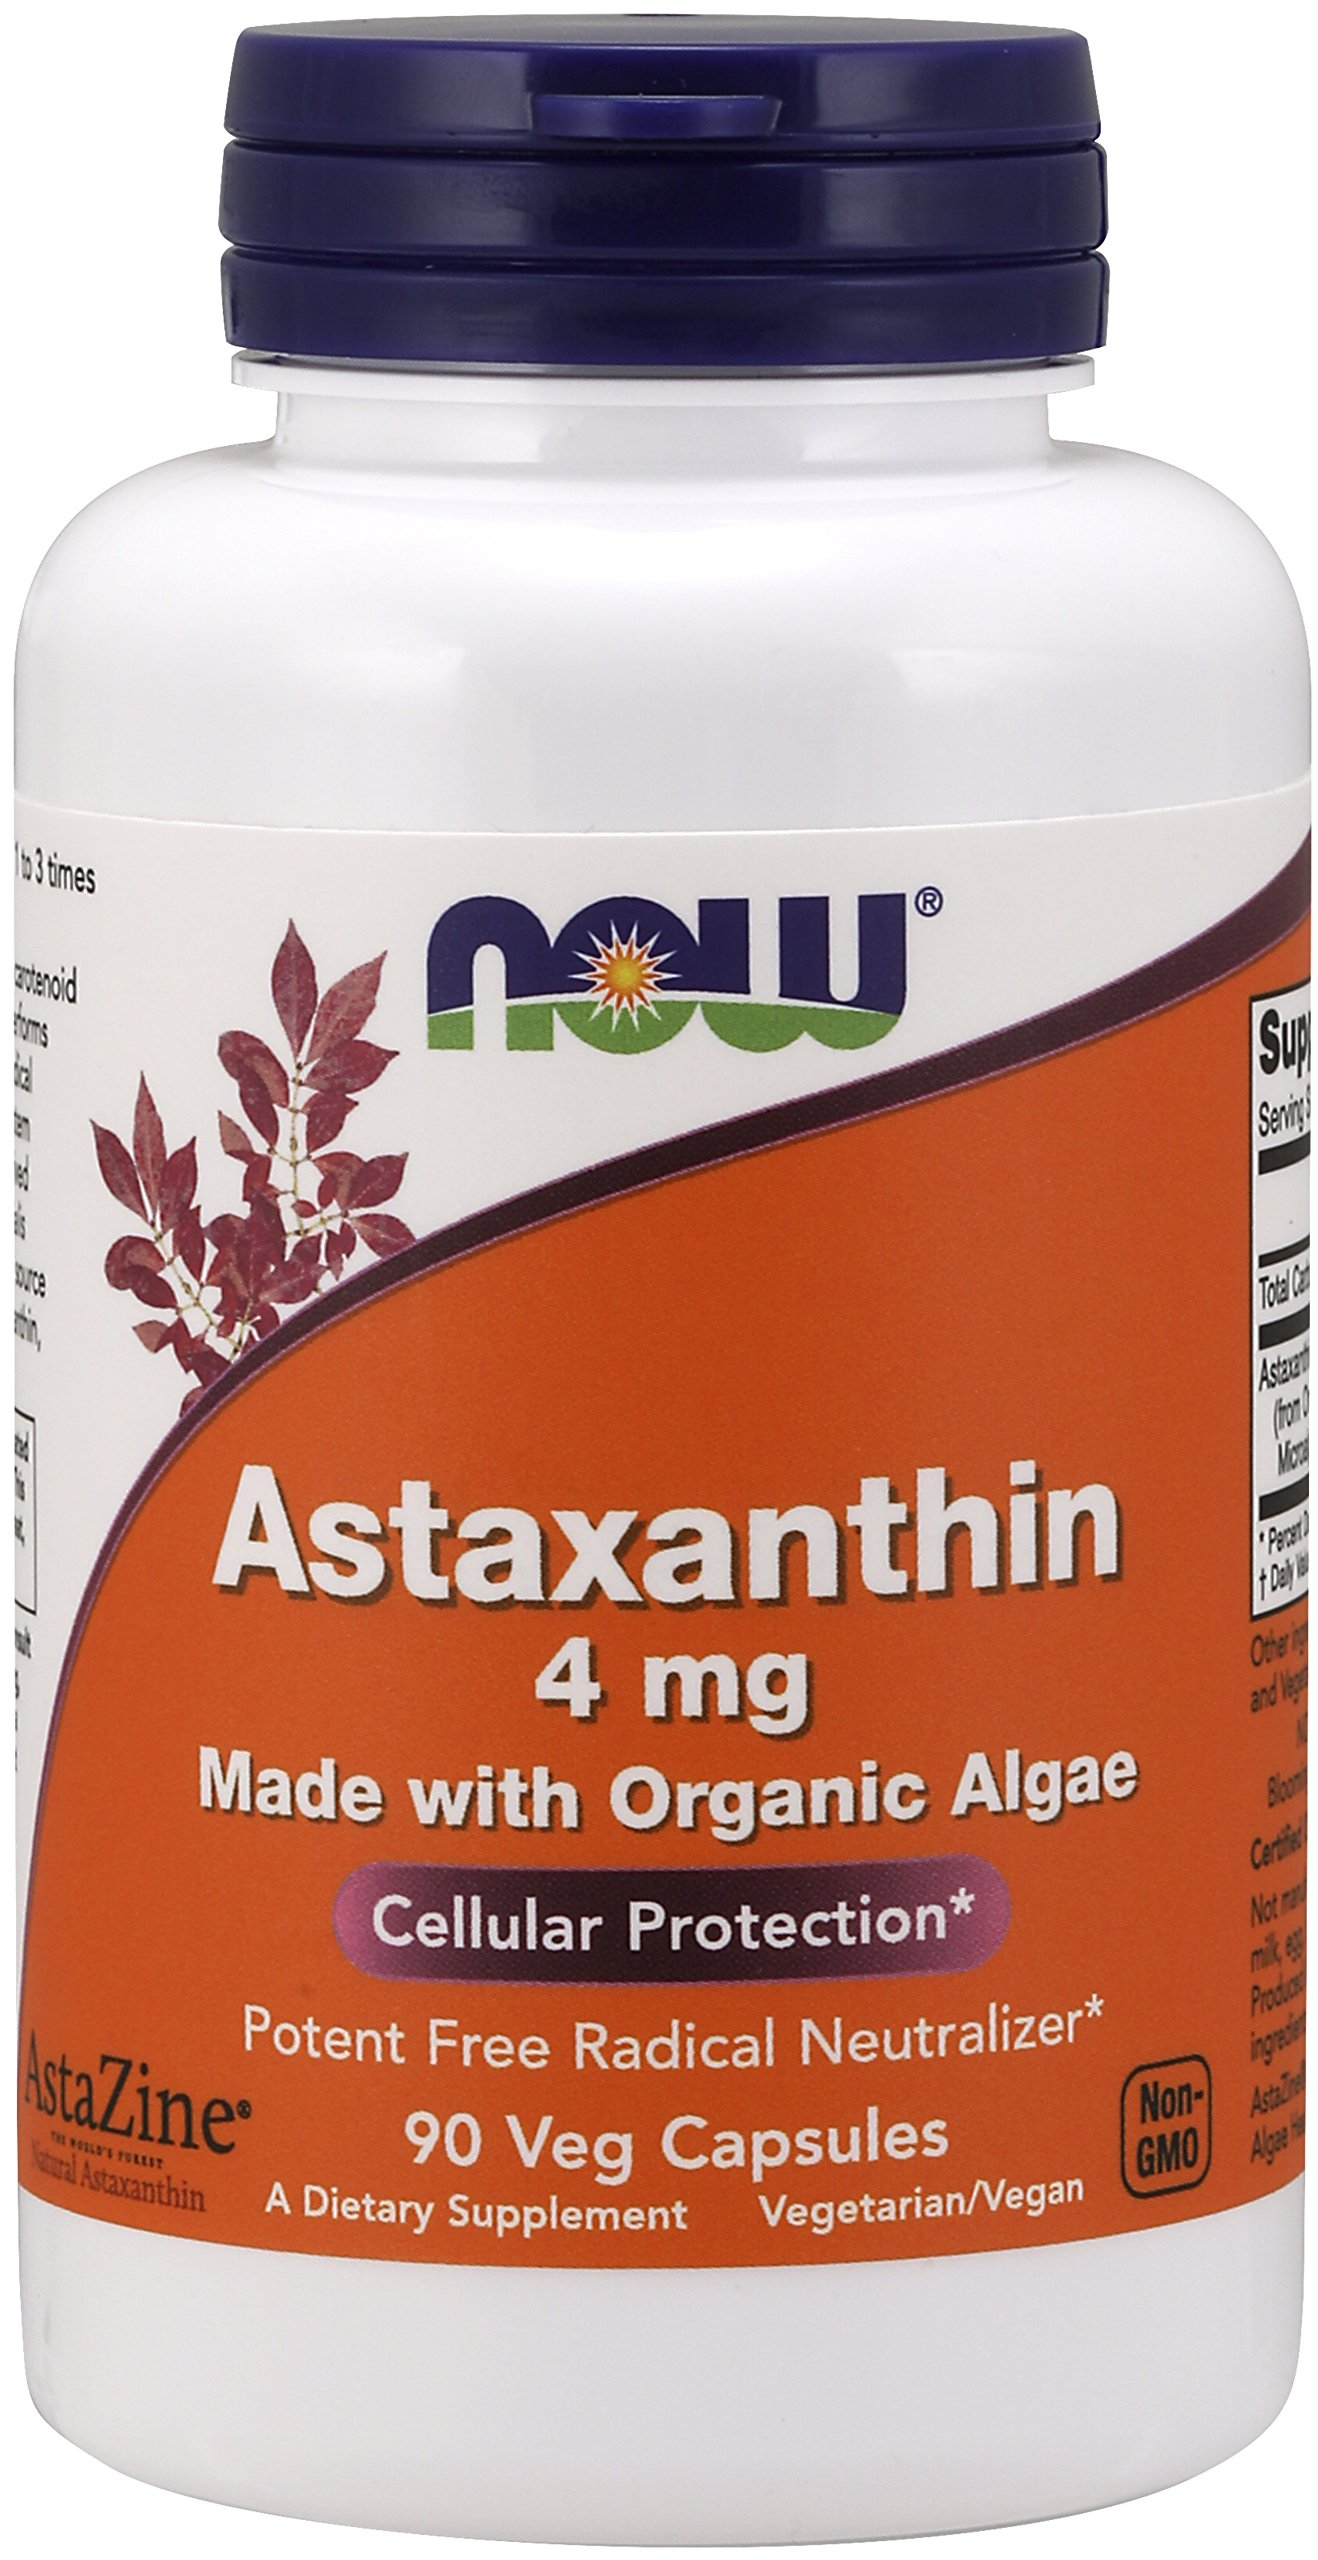 Now Astaxanthin 4 mg, 90 Veg Capsules